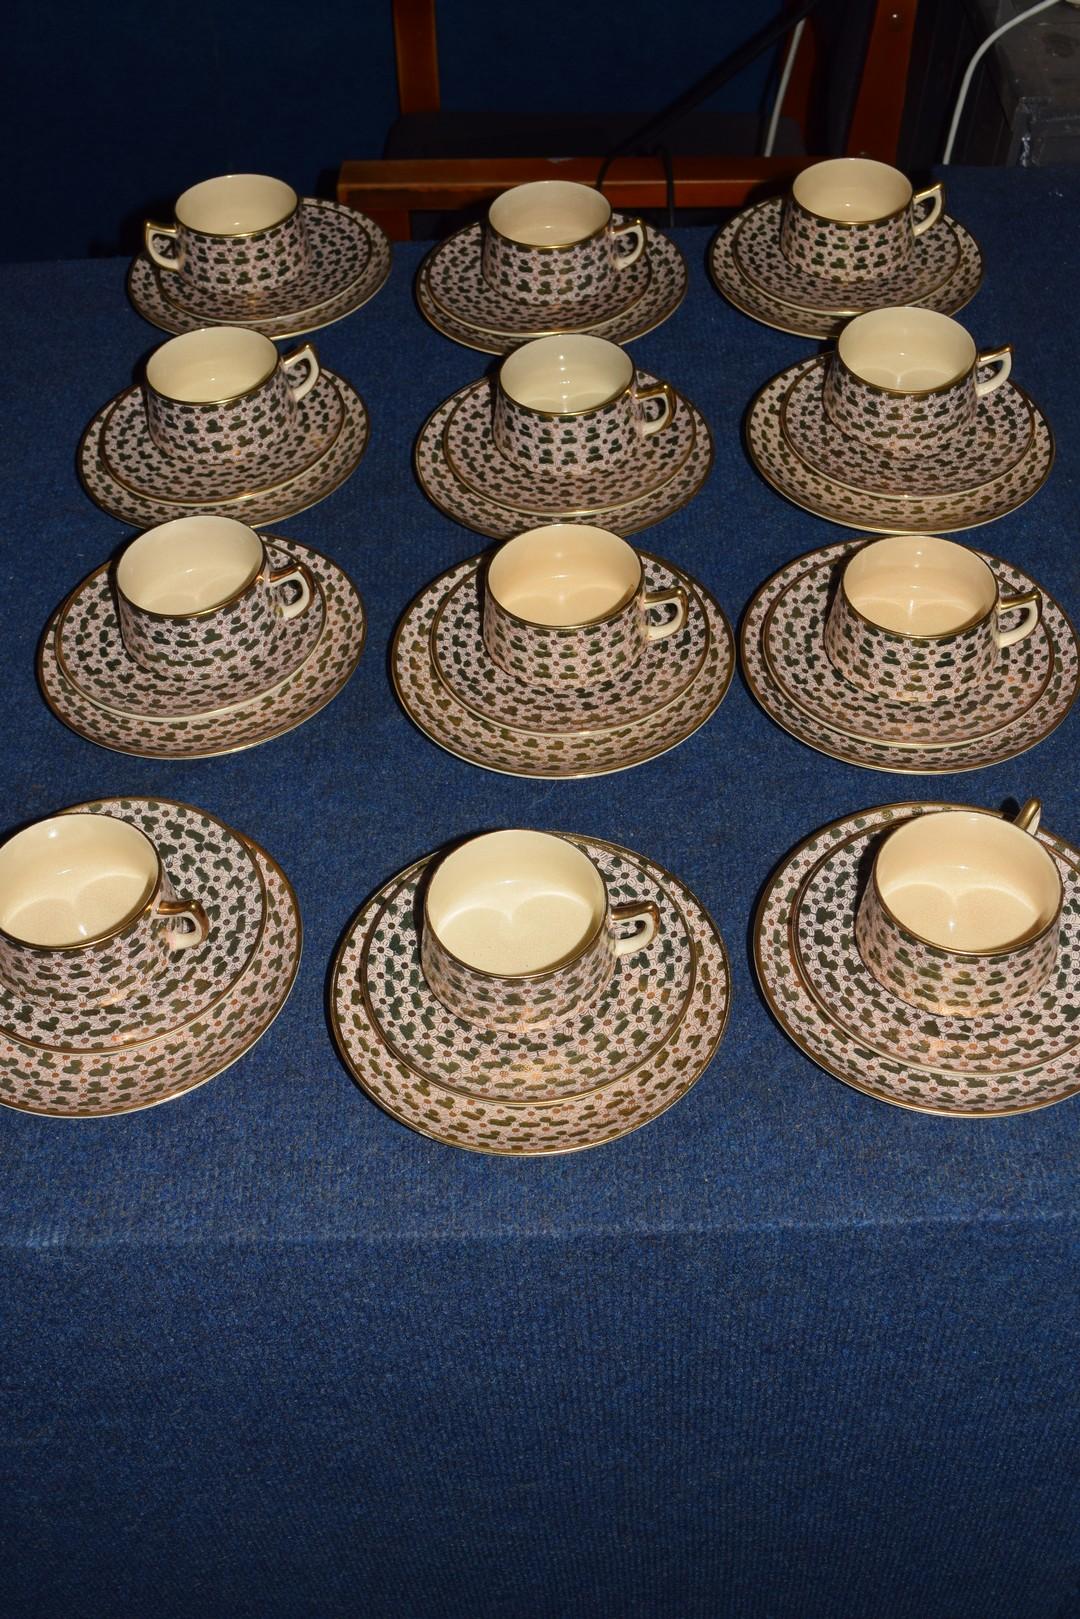 Twelve piece Satsuma tea set - Image 6 of 7